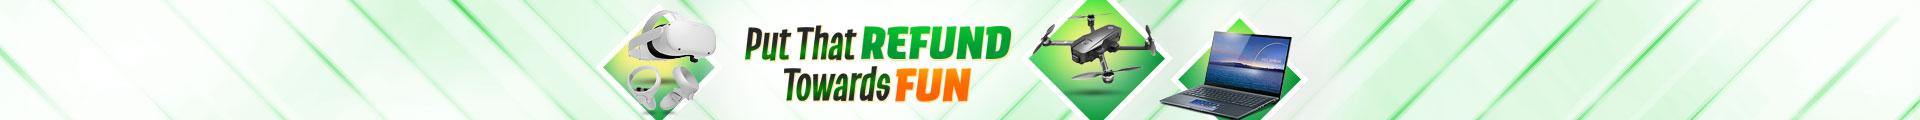 Put That Refund Towards Fun